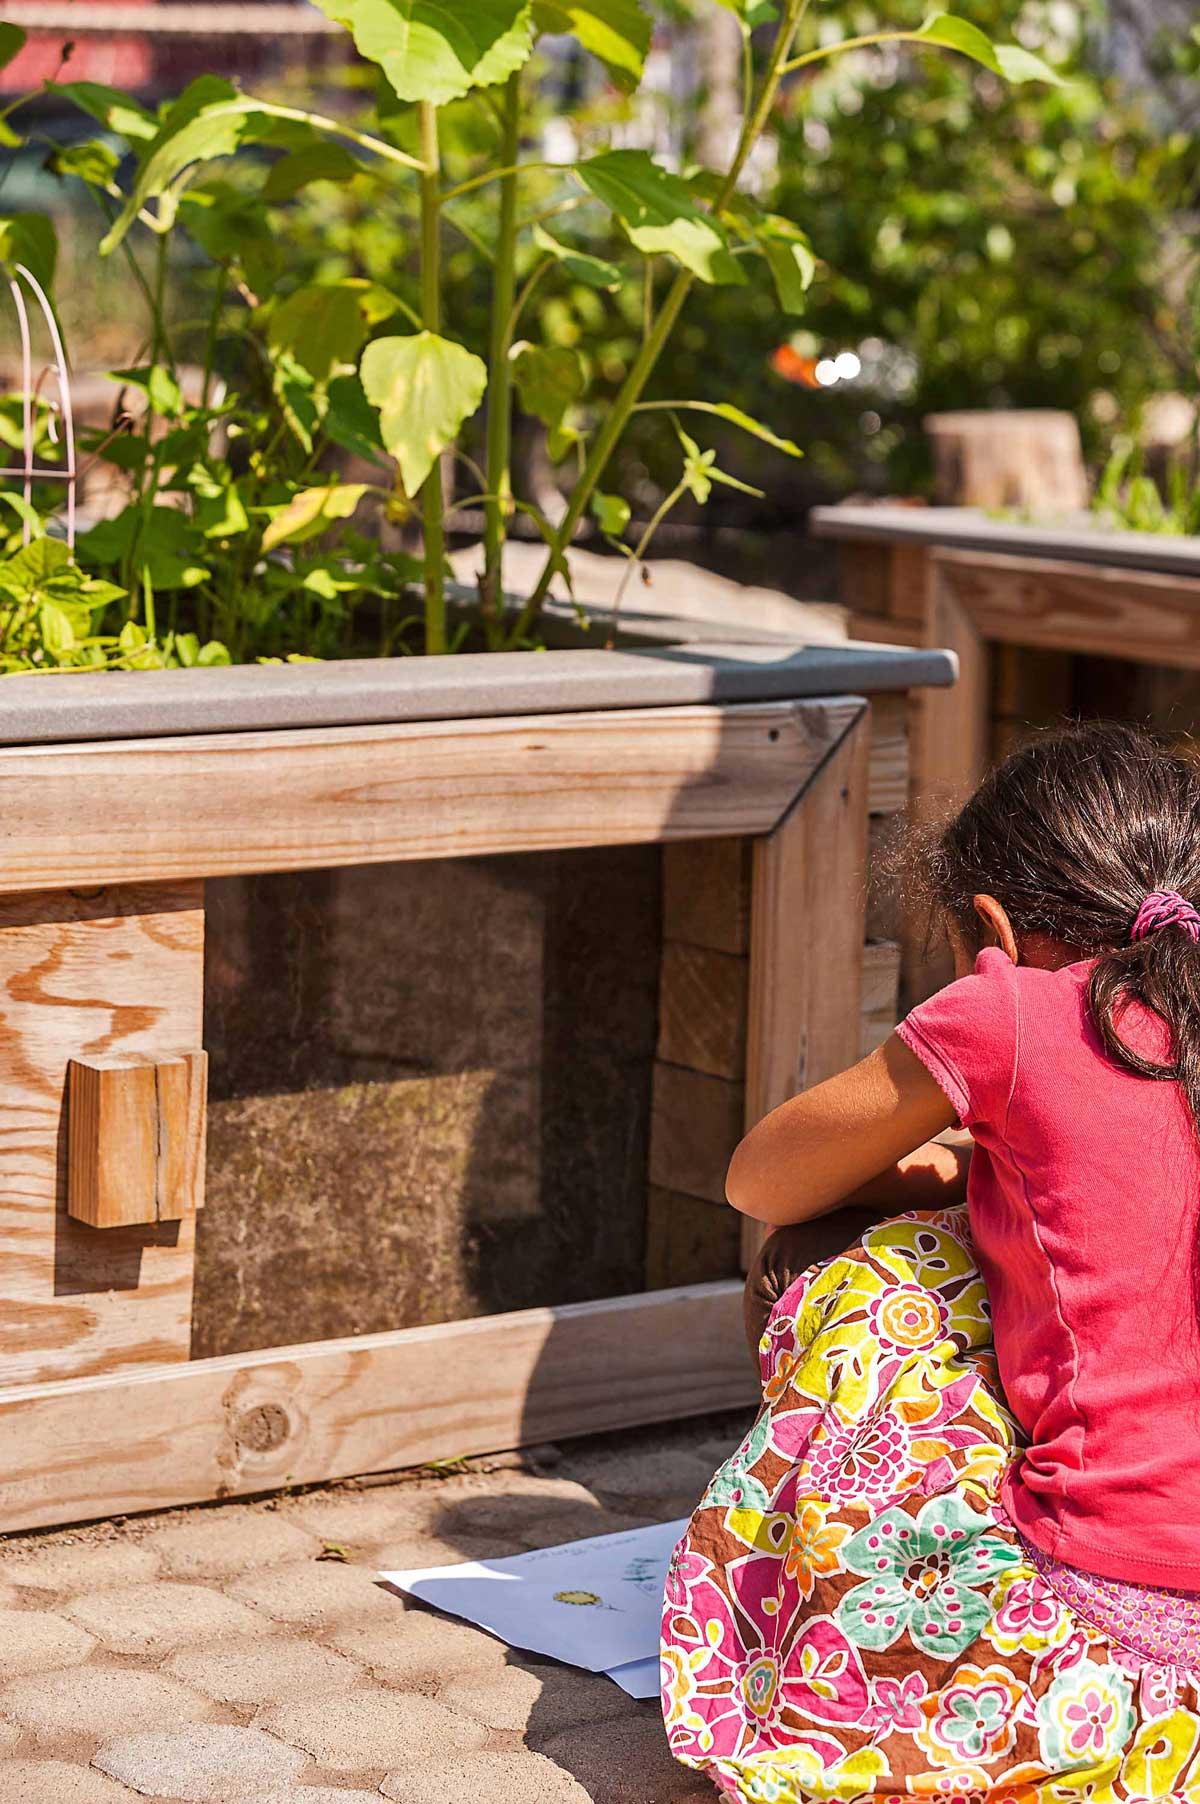 5_Schoolyard-Initiative_Klopfer-Martin-Design-Group_outdoor-classroom.jpg